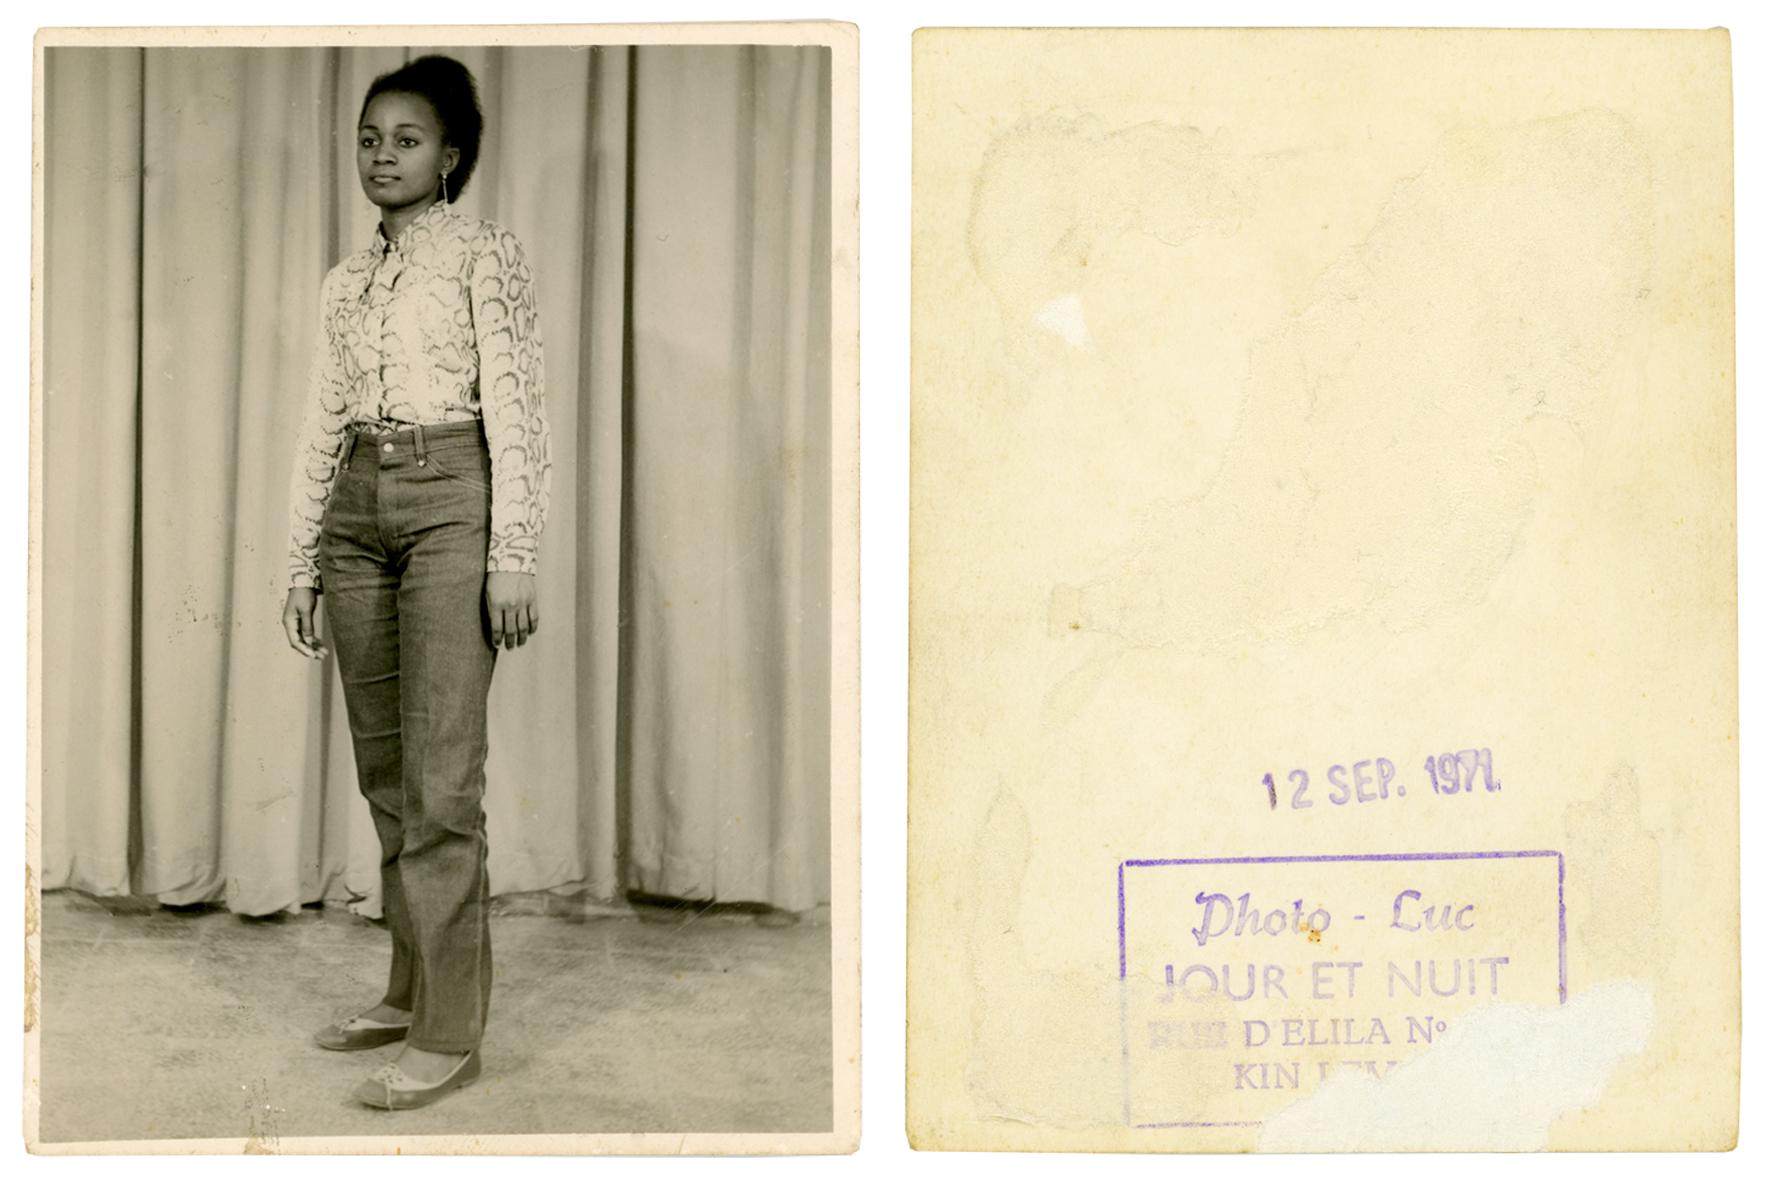 2. Photo Luc 12 Sept 1971